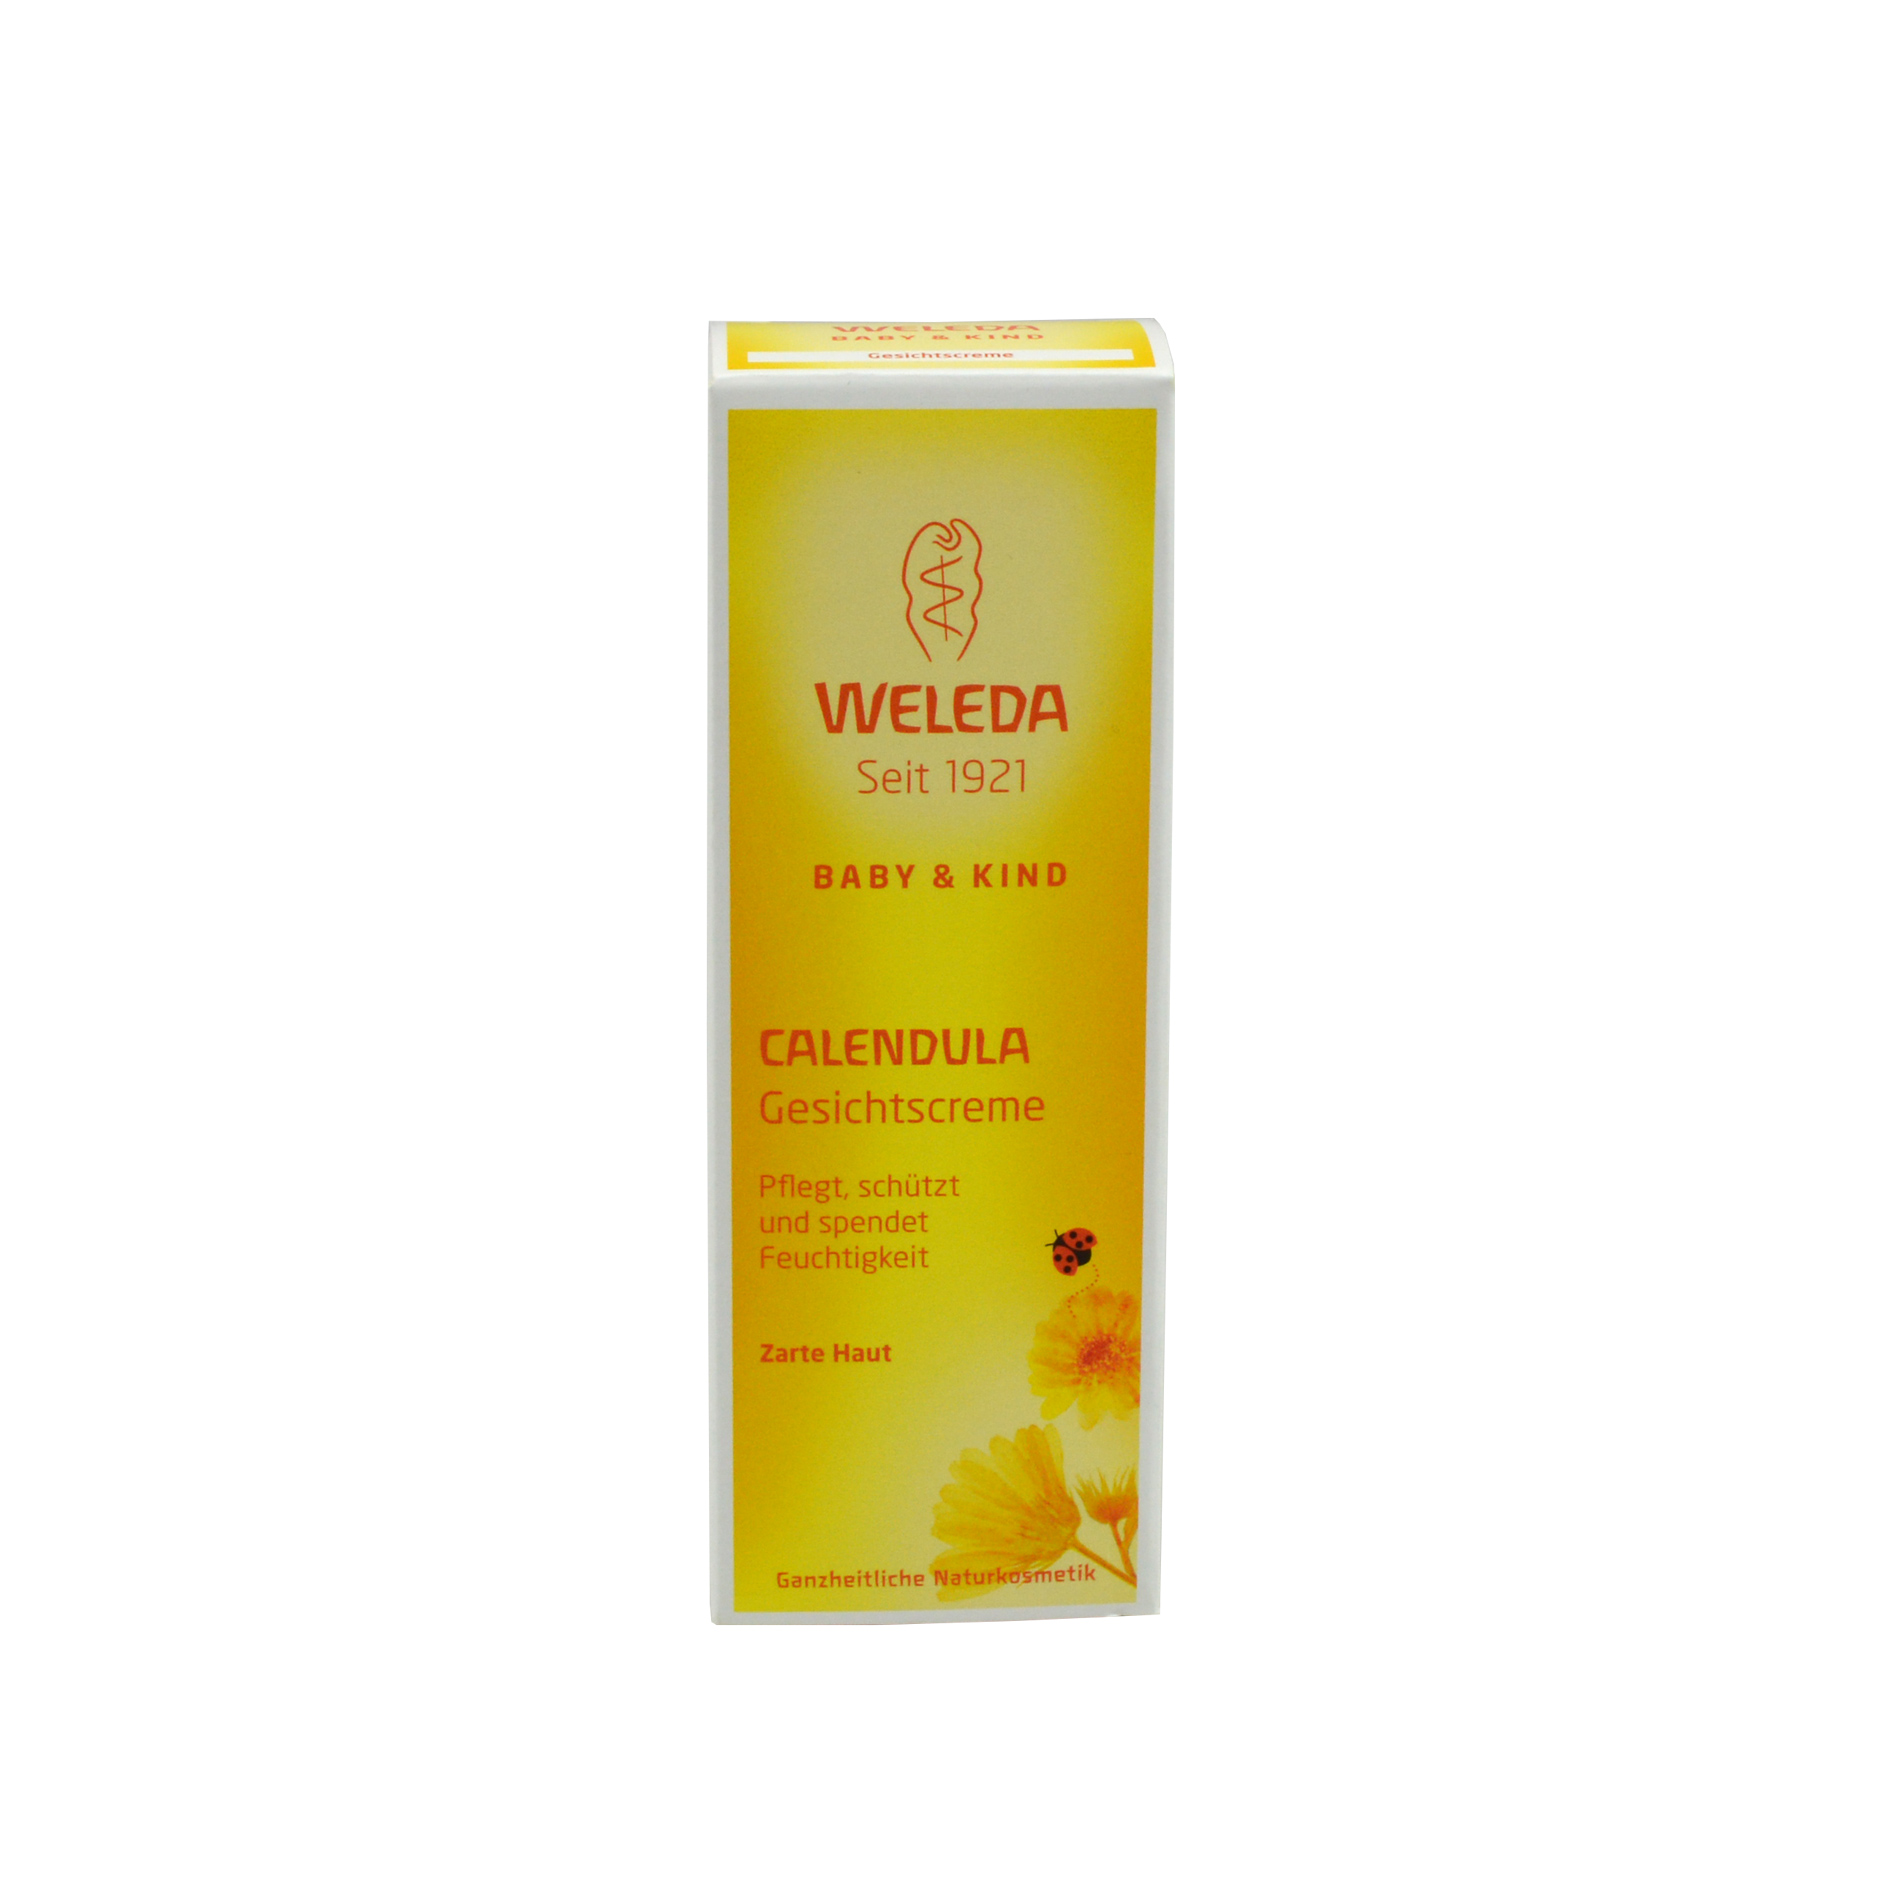 Weleda Calendula Face Cream 50 Ml Buy At Kidsroom Care